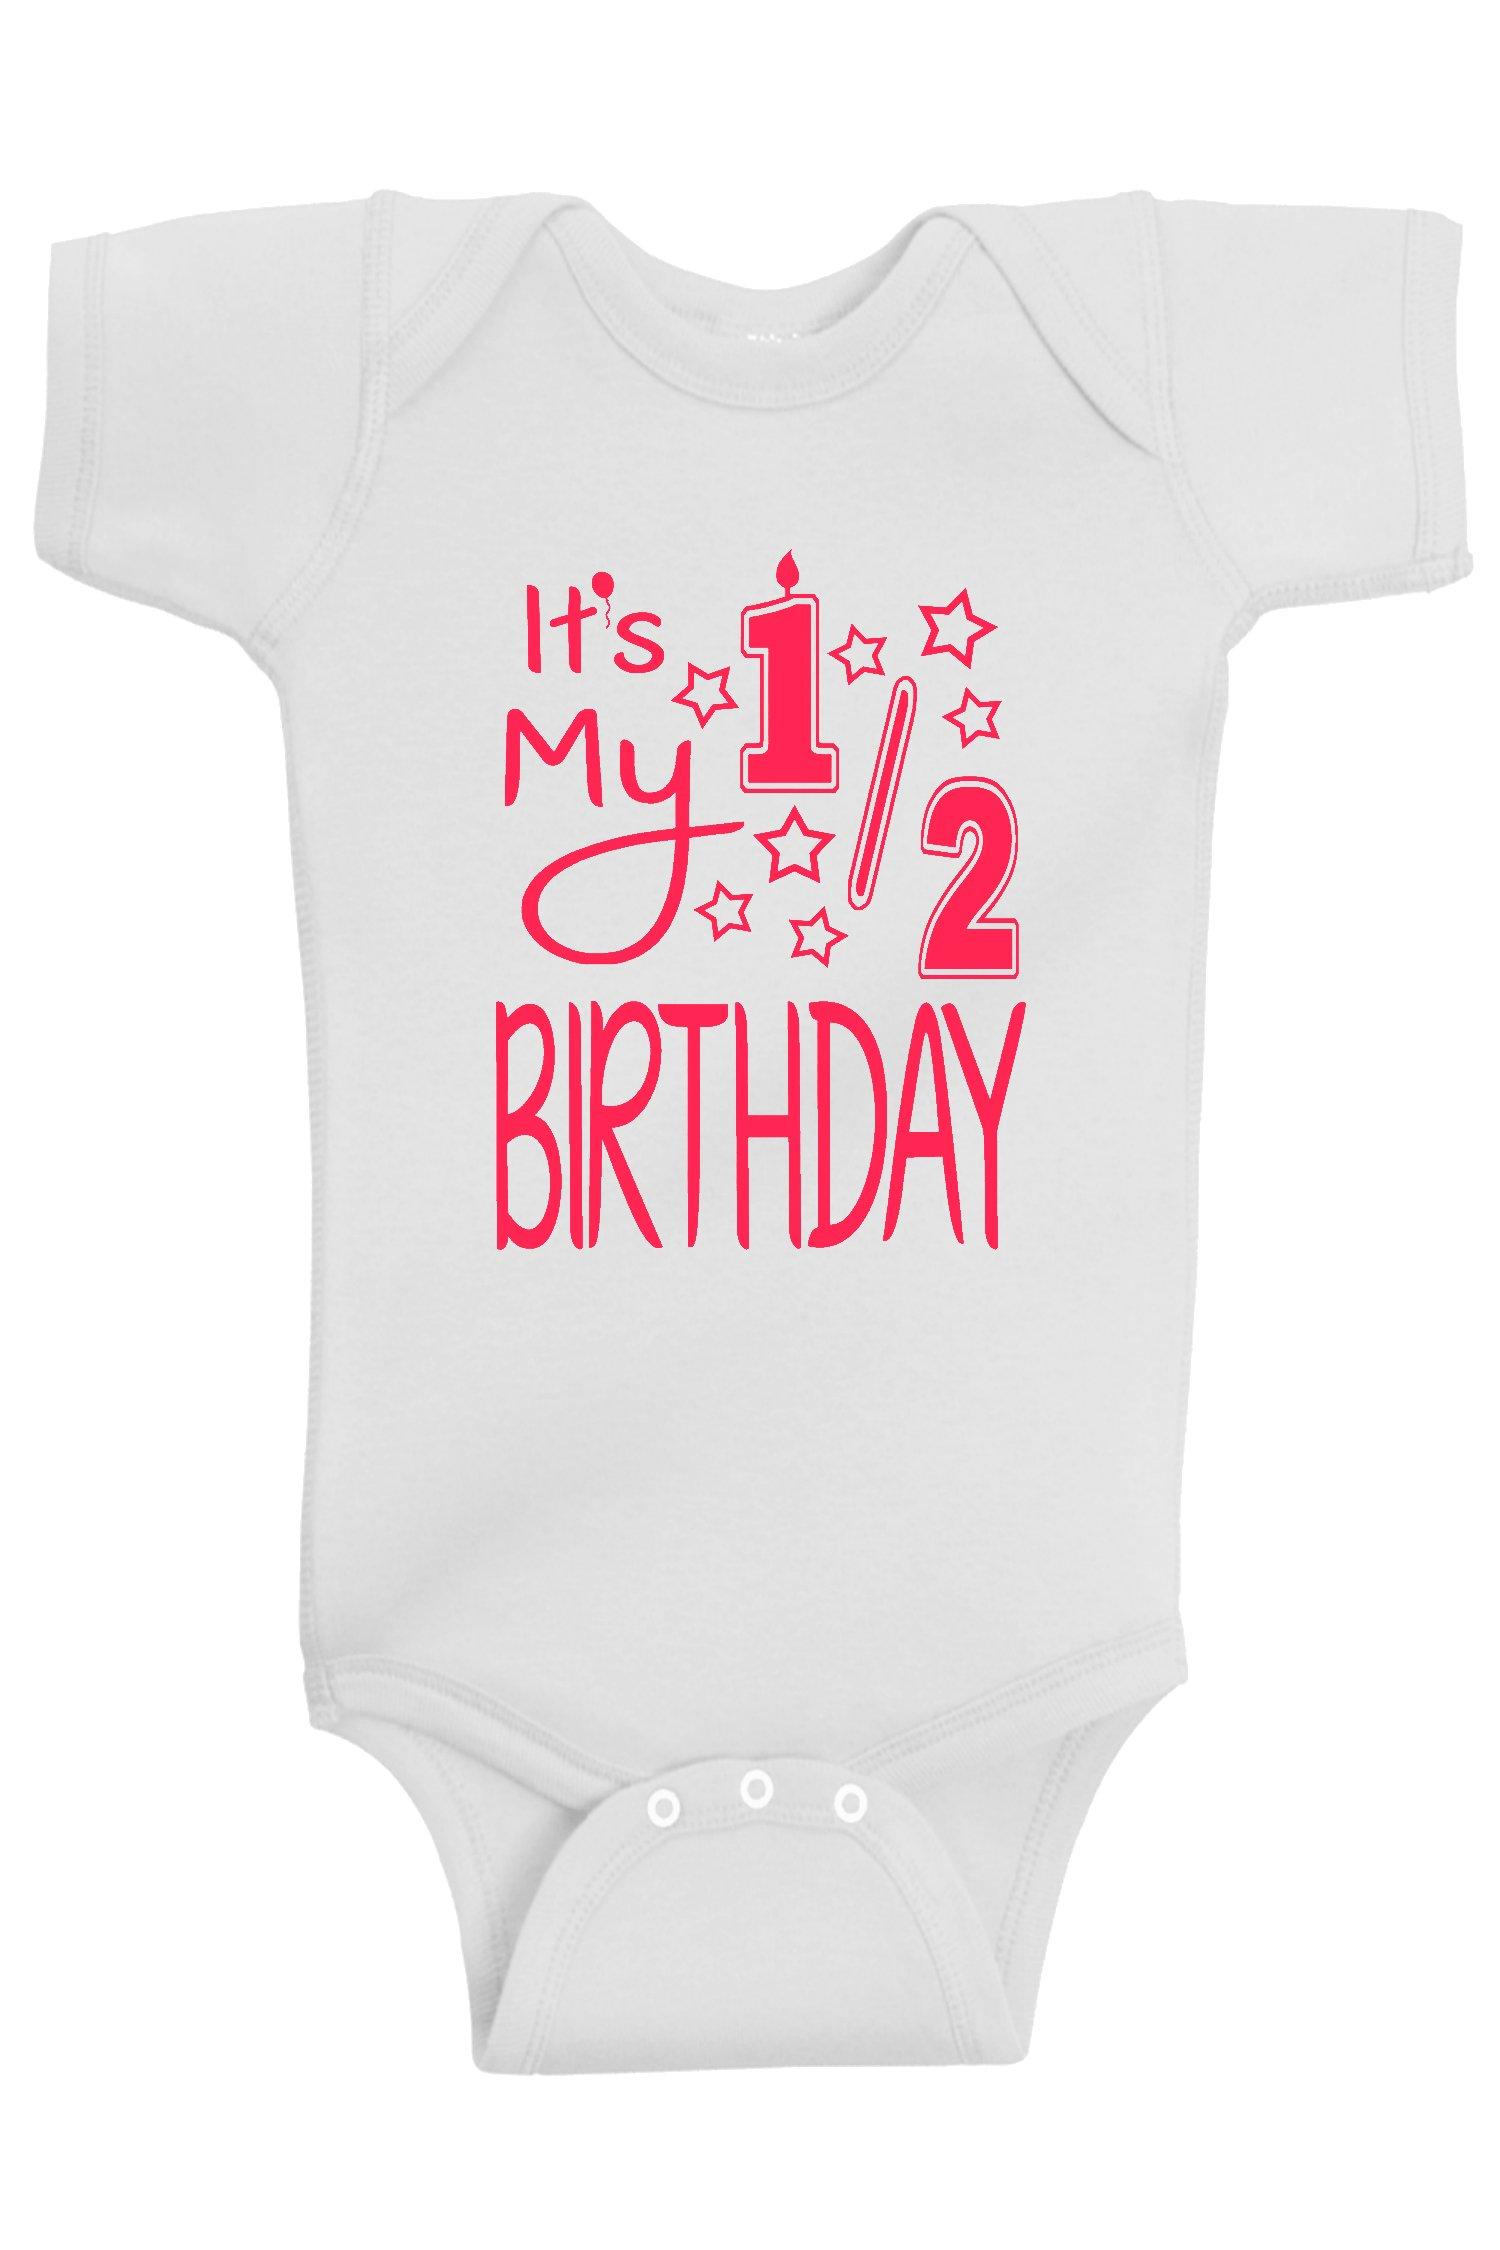 ddde8dd31 Reaxion Aiden s Corner - It s My Half Birthday 1 2 Baby Girl ...